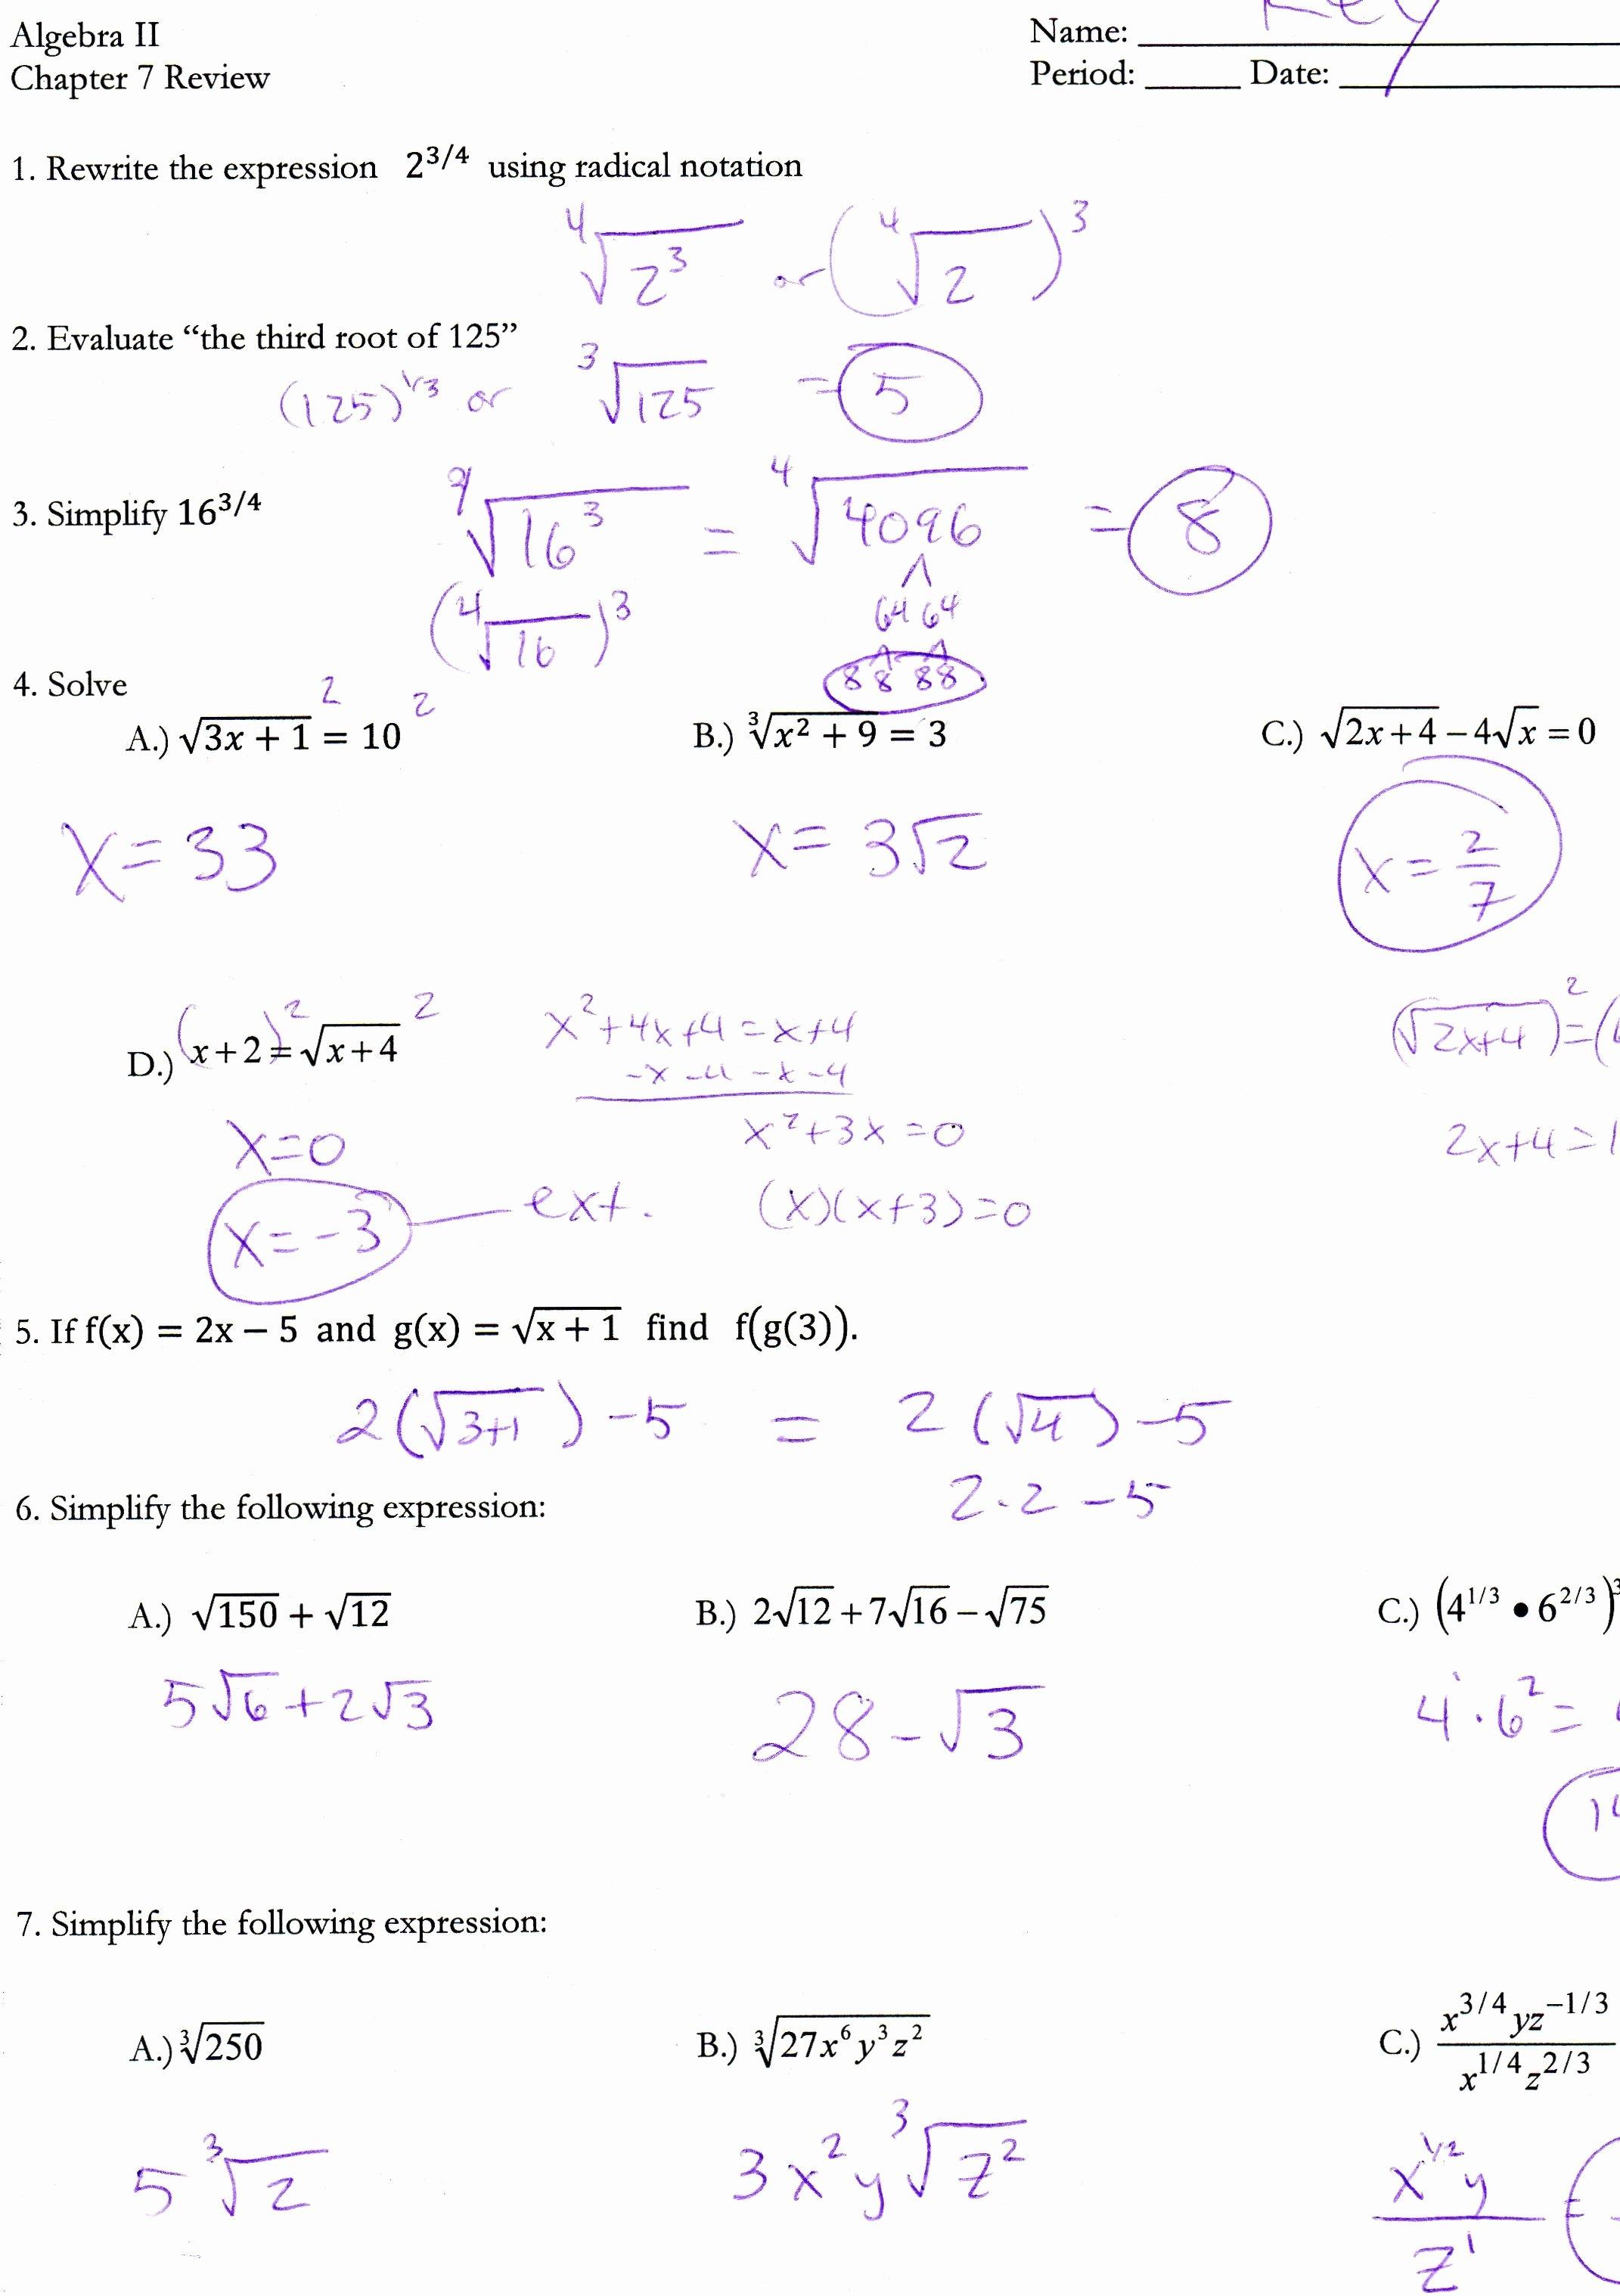 Solve Radical Equations Worksheet Luxury Radicals Worksheet Algebra 2